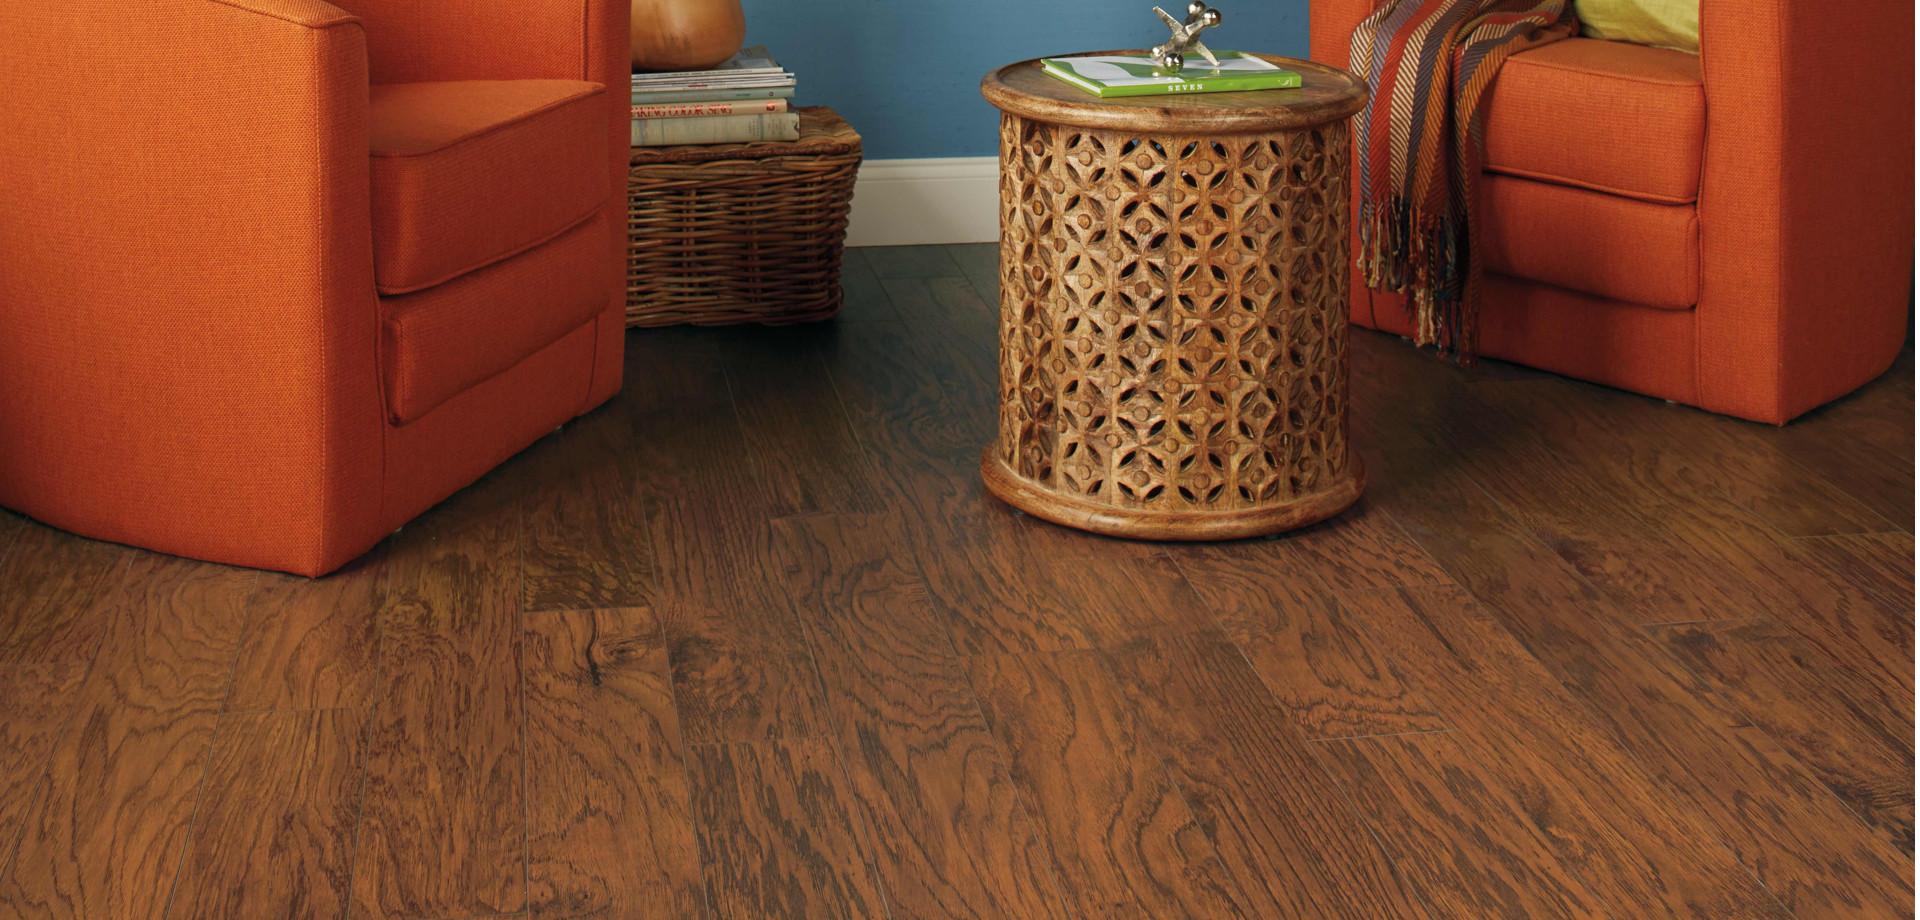 Costco Hardwood Flooring Sale Of Floor Inspiring Interior Floor Design Ideas by Harmonics Flooring Intended for Harmonics Costco Harmonics Flooring Harmonics Flooring Review